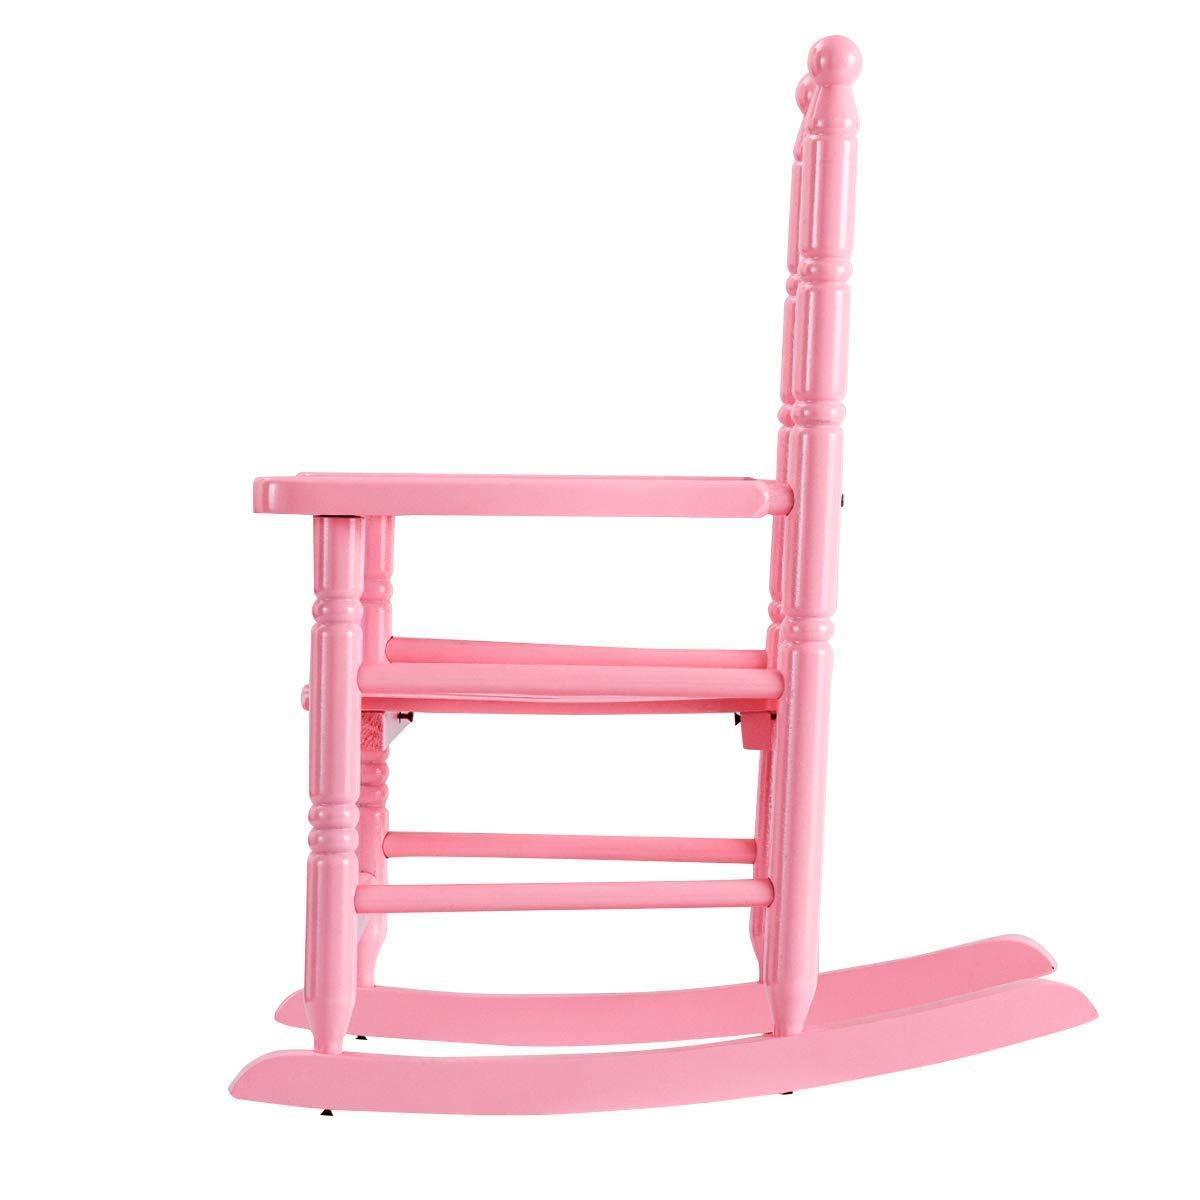 HONEY JOY Kids Rocking Chair, Wooden Classic Porch Rocker, Double Slat Back Rocking Chair (Pink) by HONEY JOY